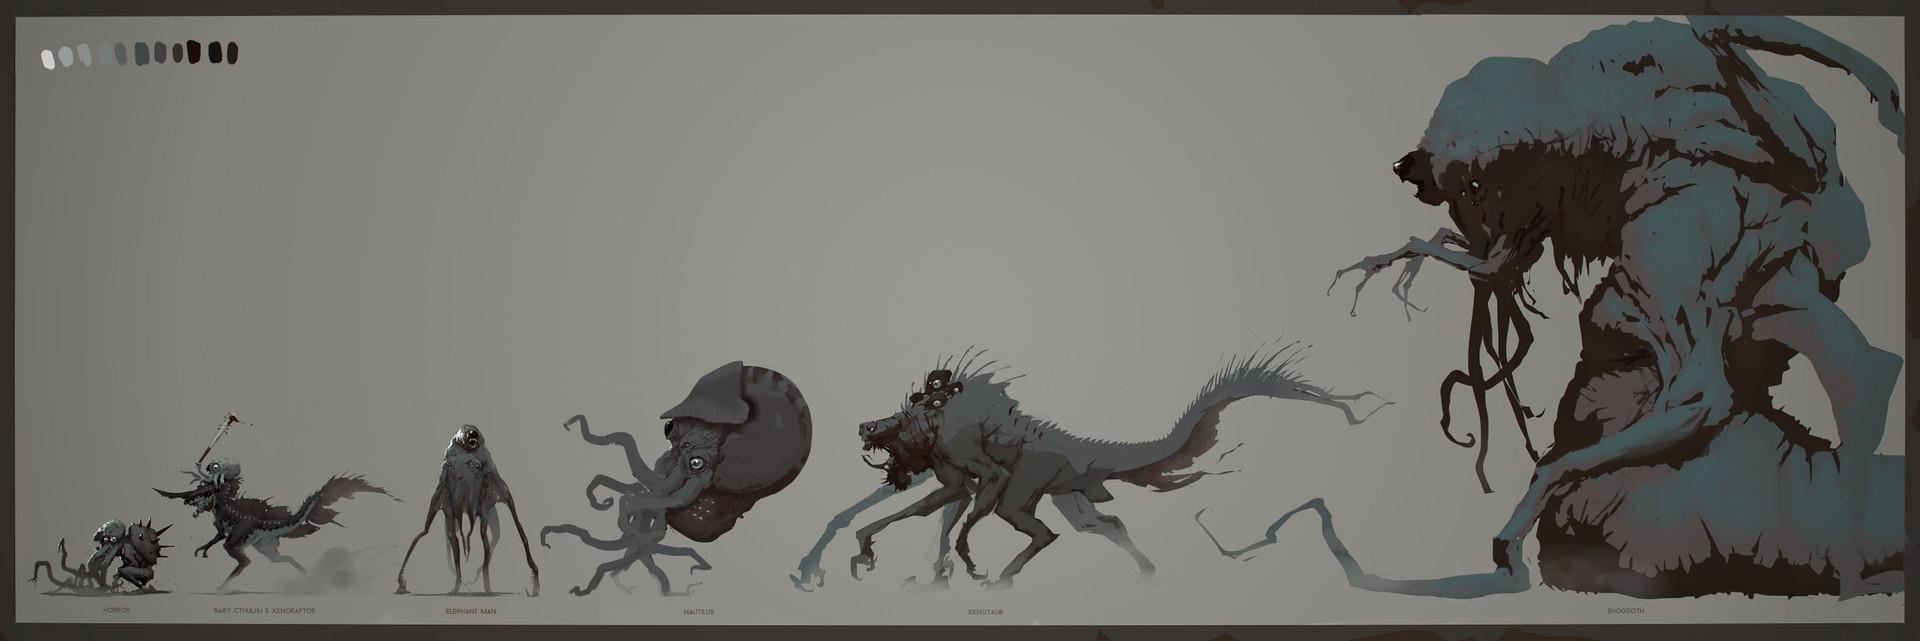 Scott flanders invader monsters 6